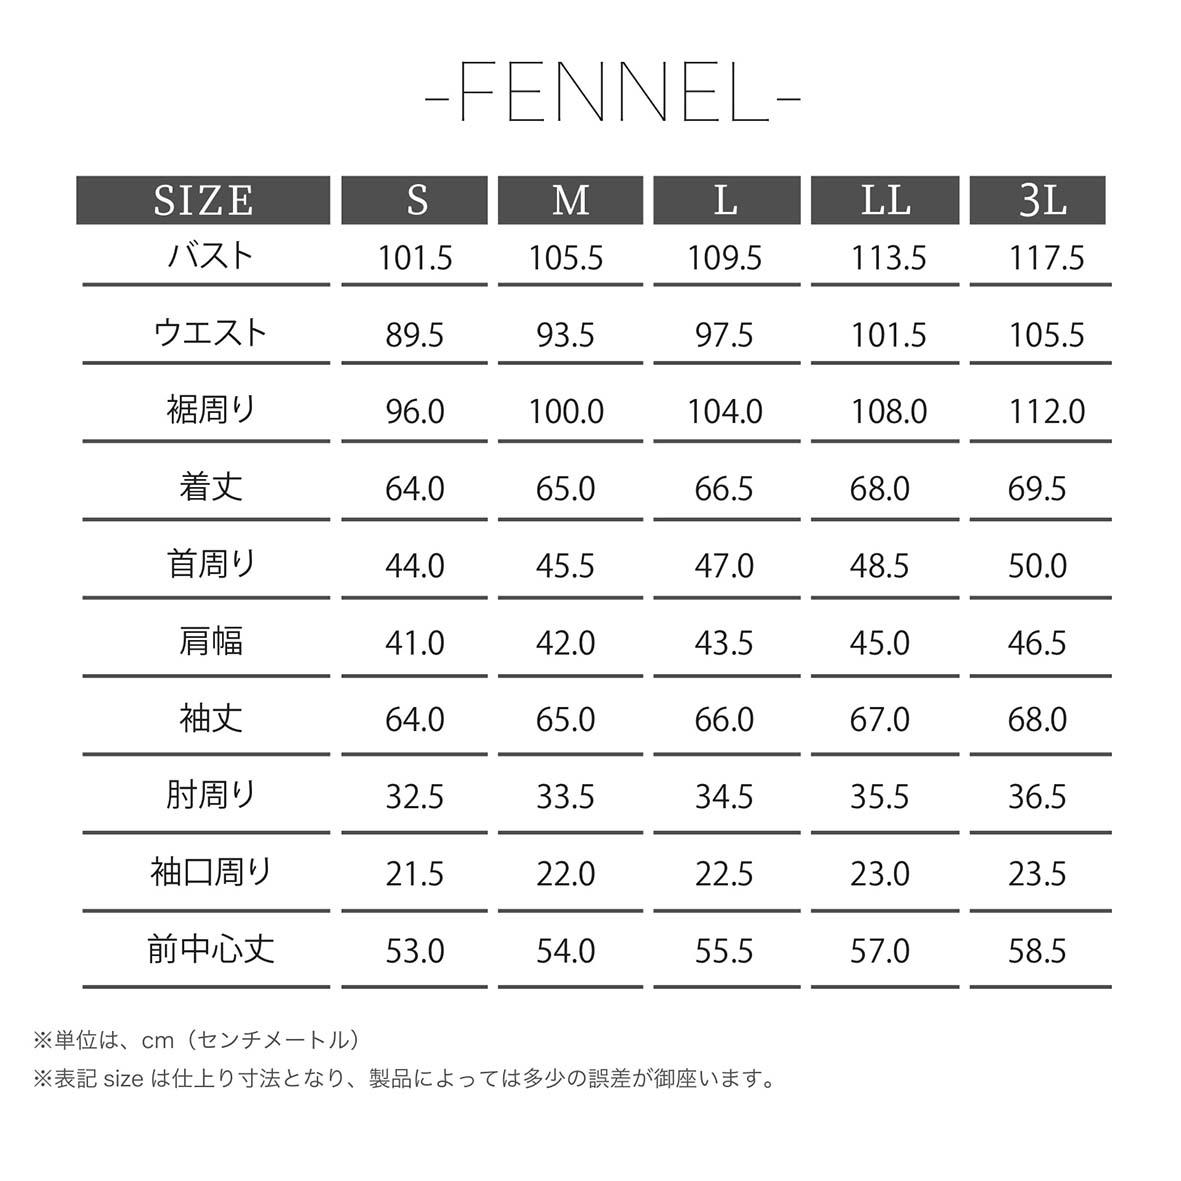 KADOYA(カドヤ) K'S LEATHER FENNEL フェンネル パデッドライダース